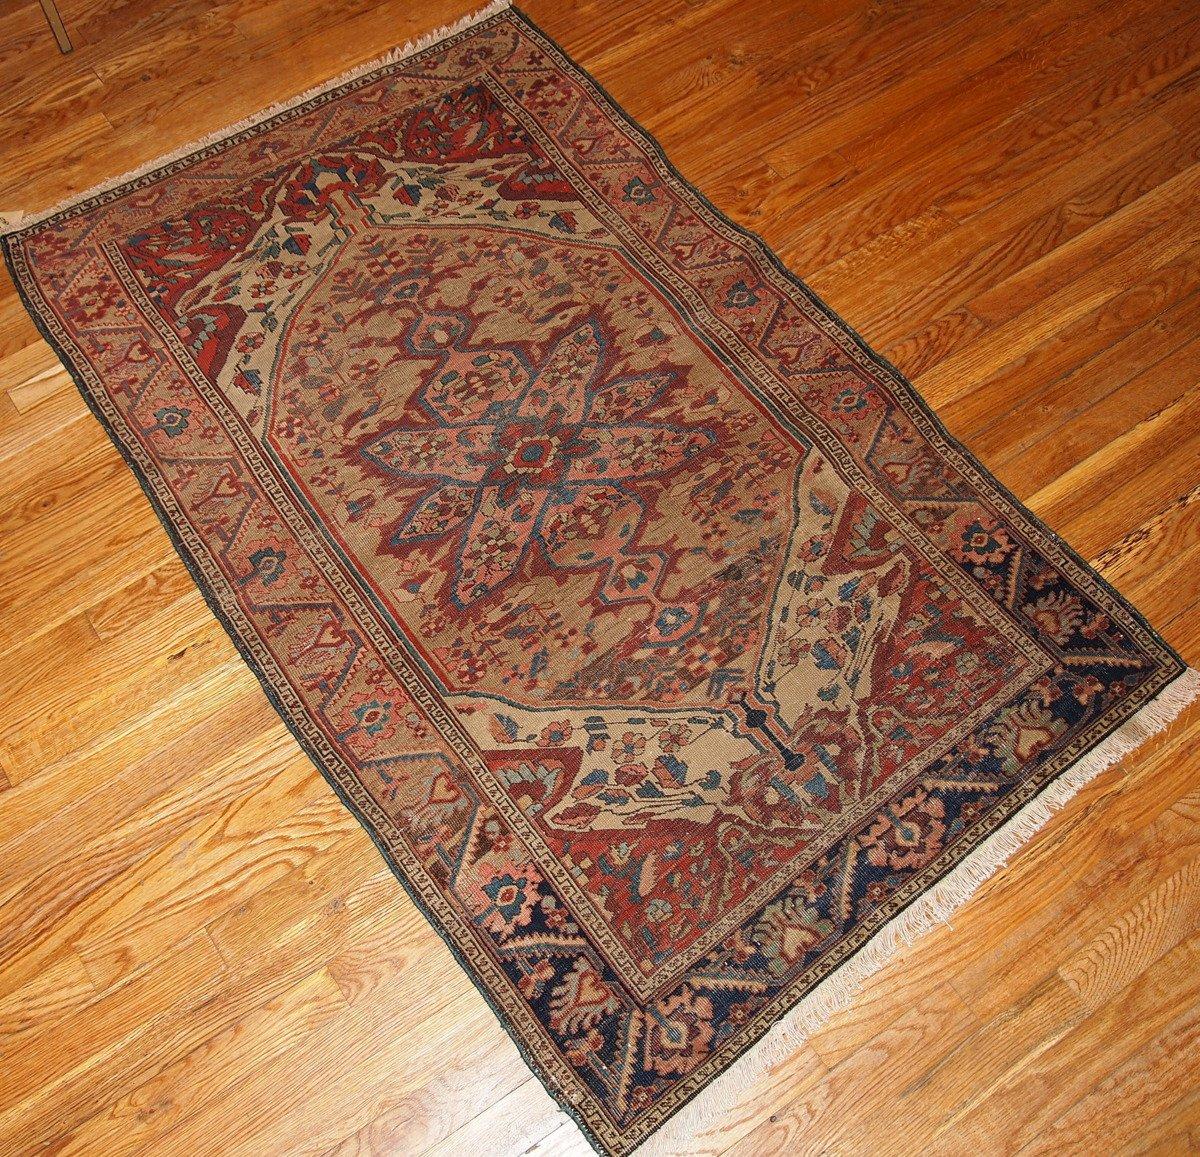 antiker persischer handgemachter sarouk farahan teppich. Black Bedroom Furniture Sets. Home Design Ideas